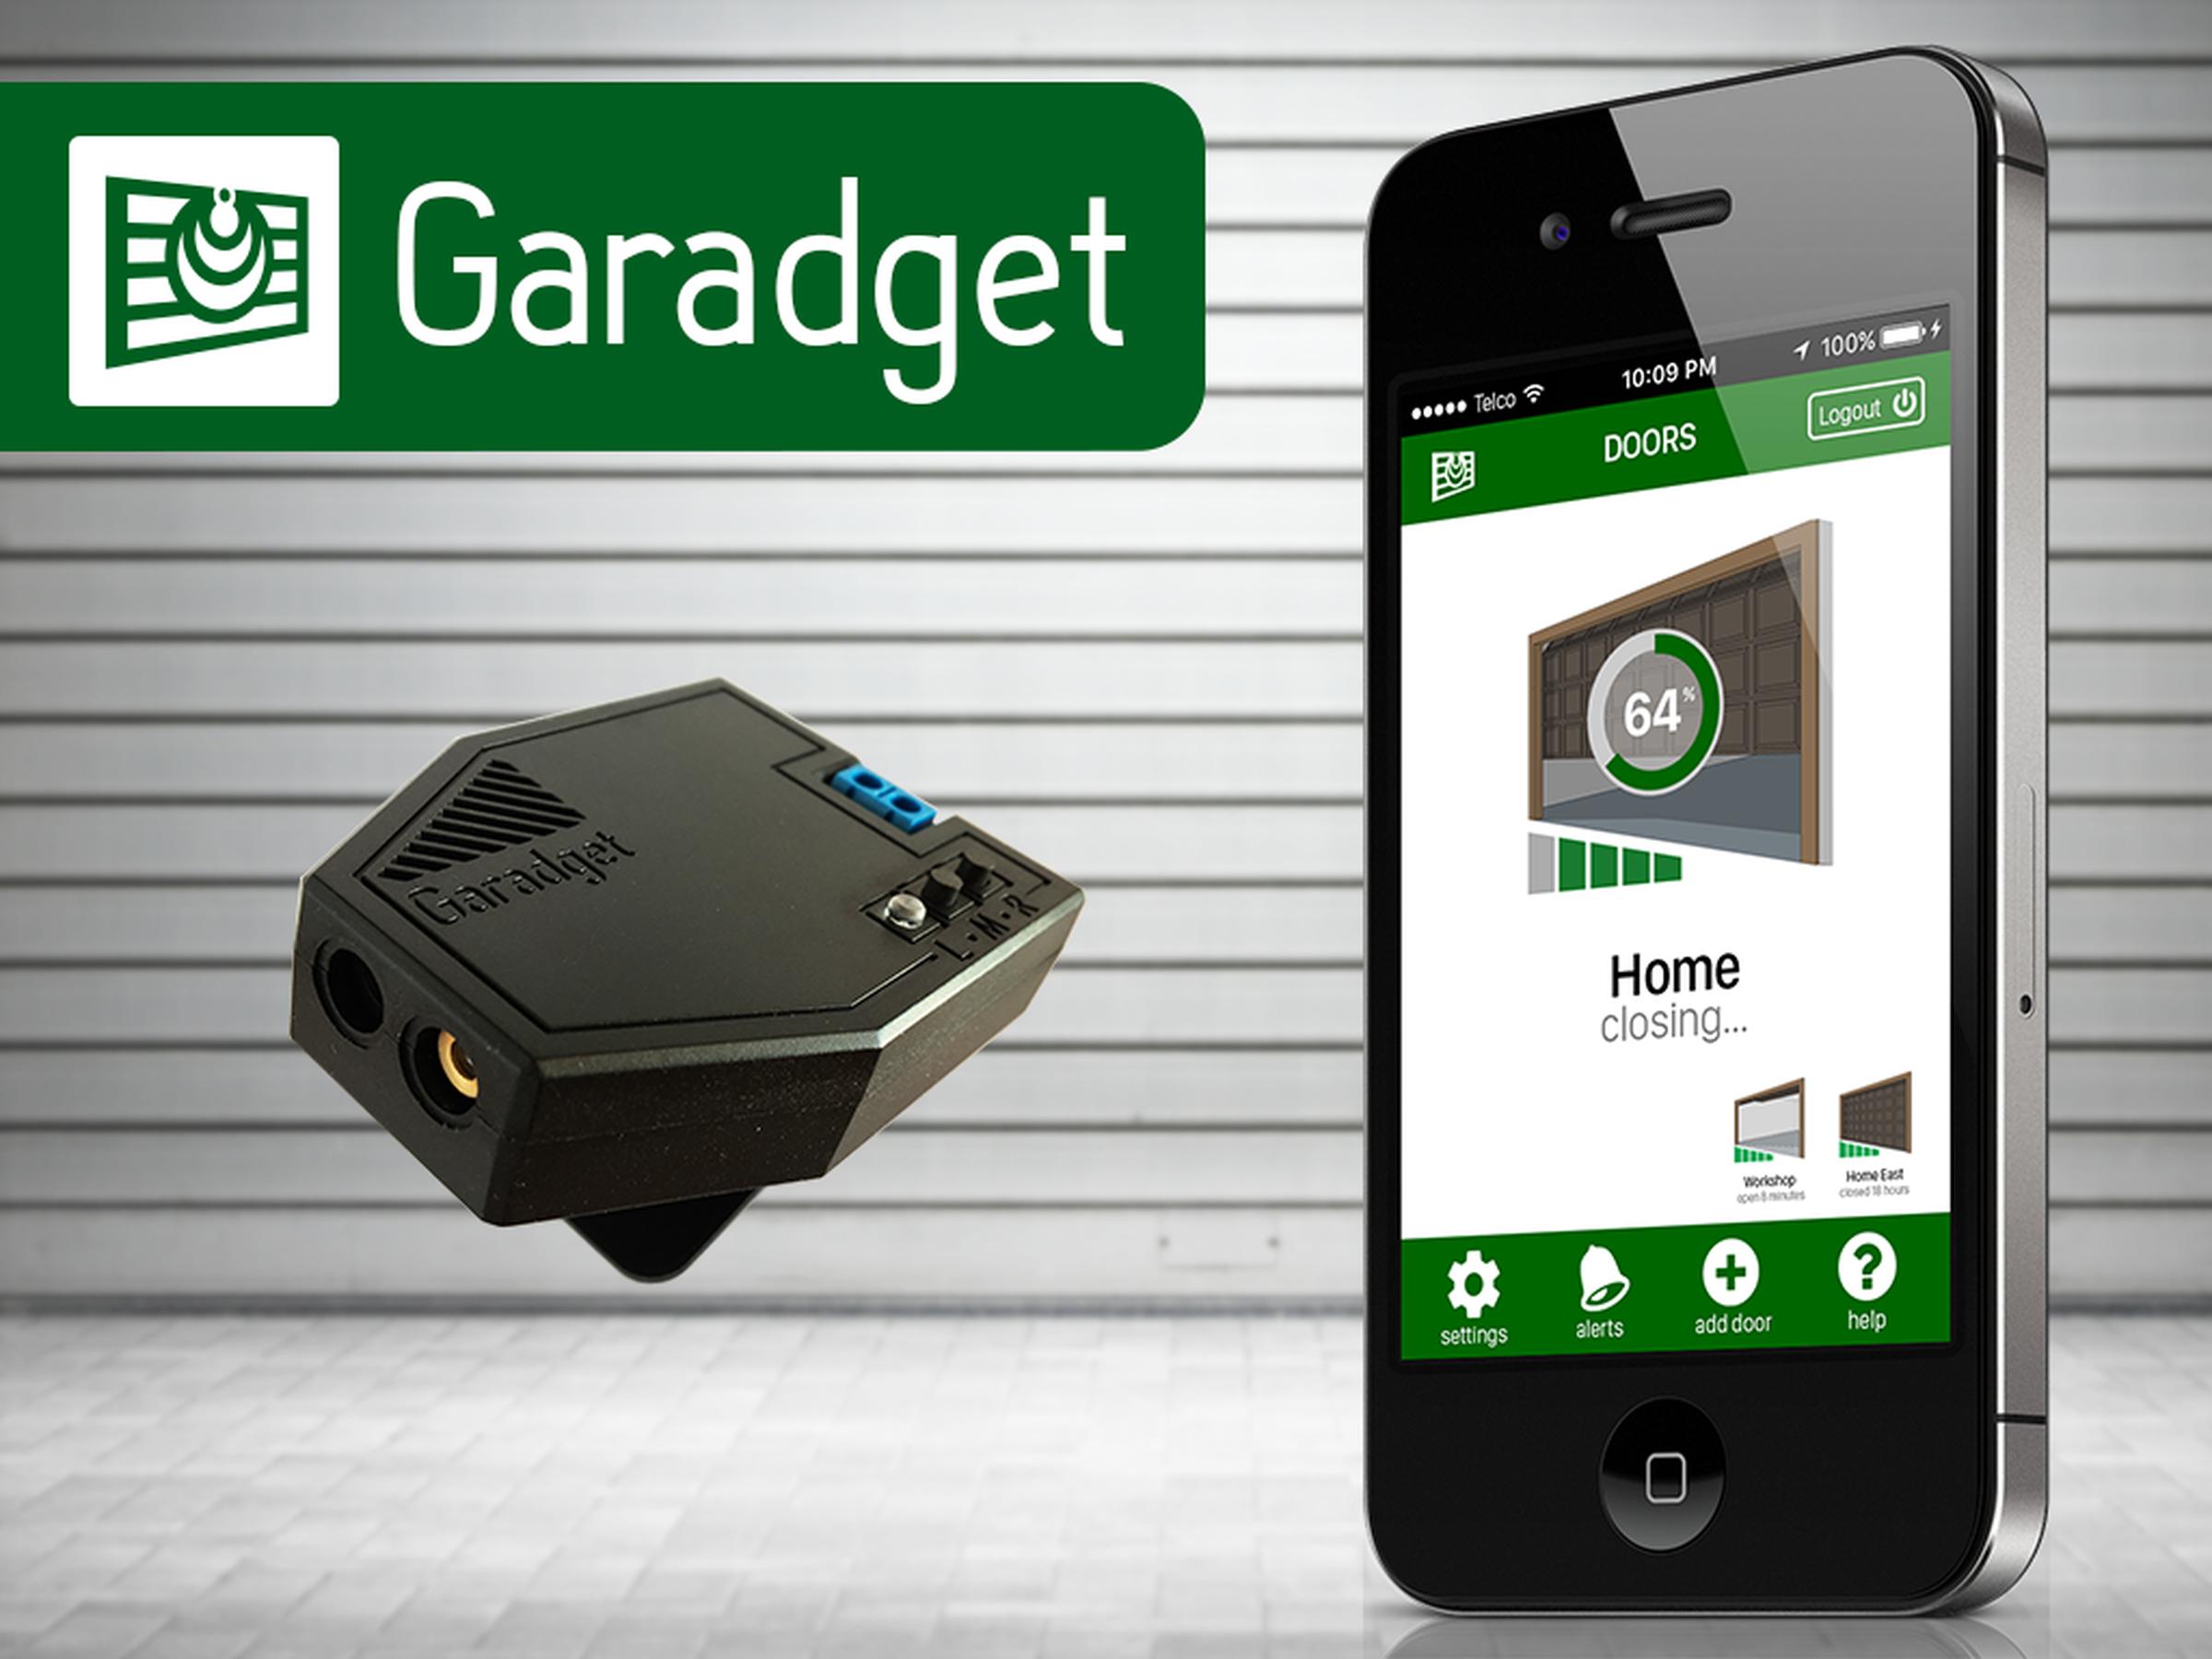 Garadget Smart Garage Door Controller From Softcomplex On Tindie